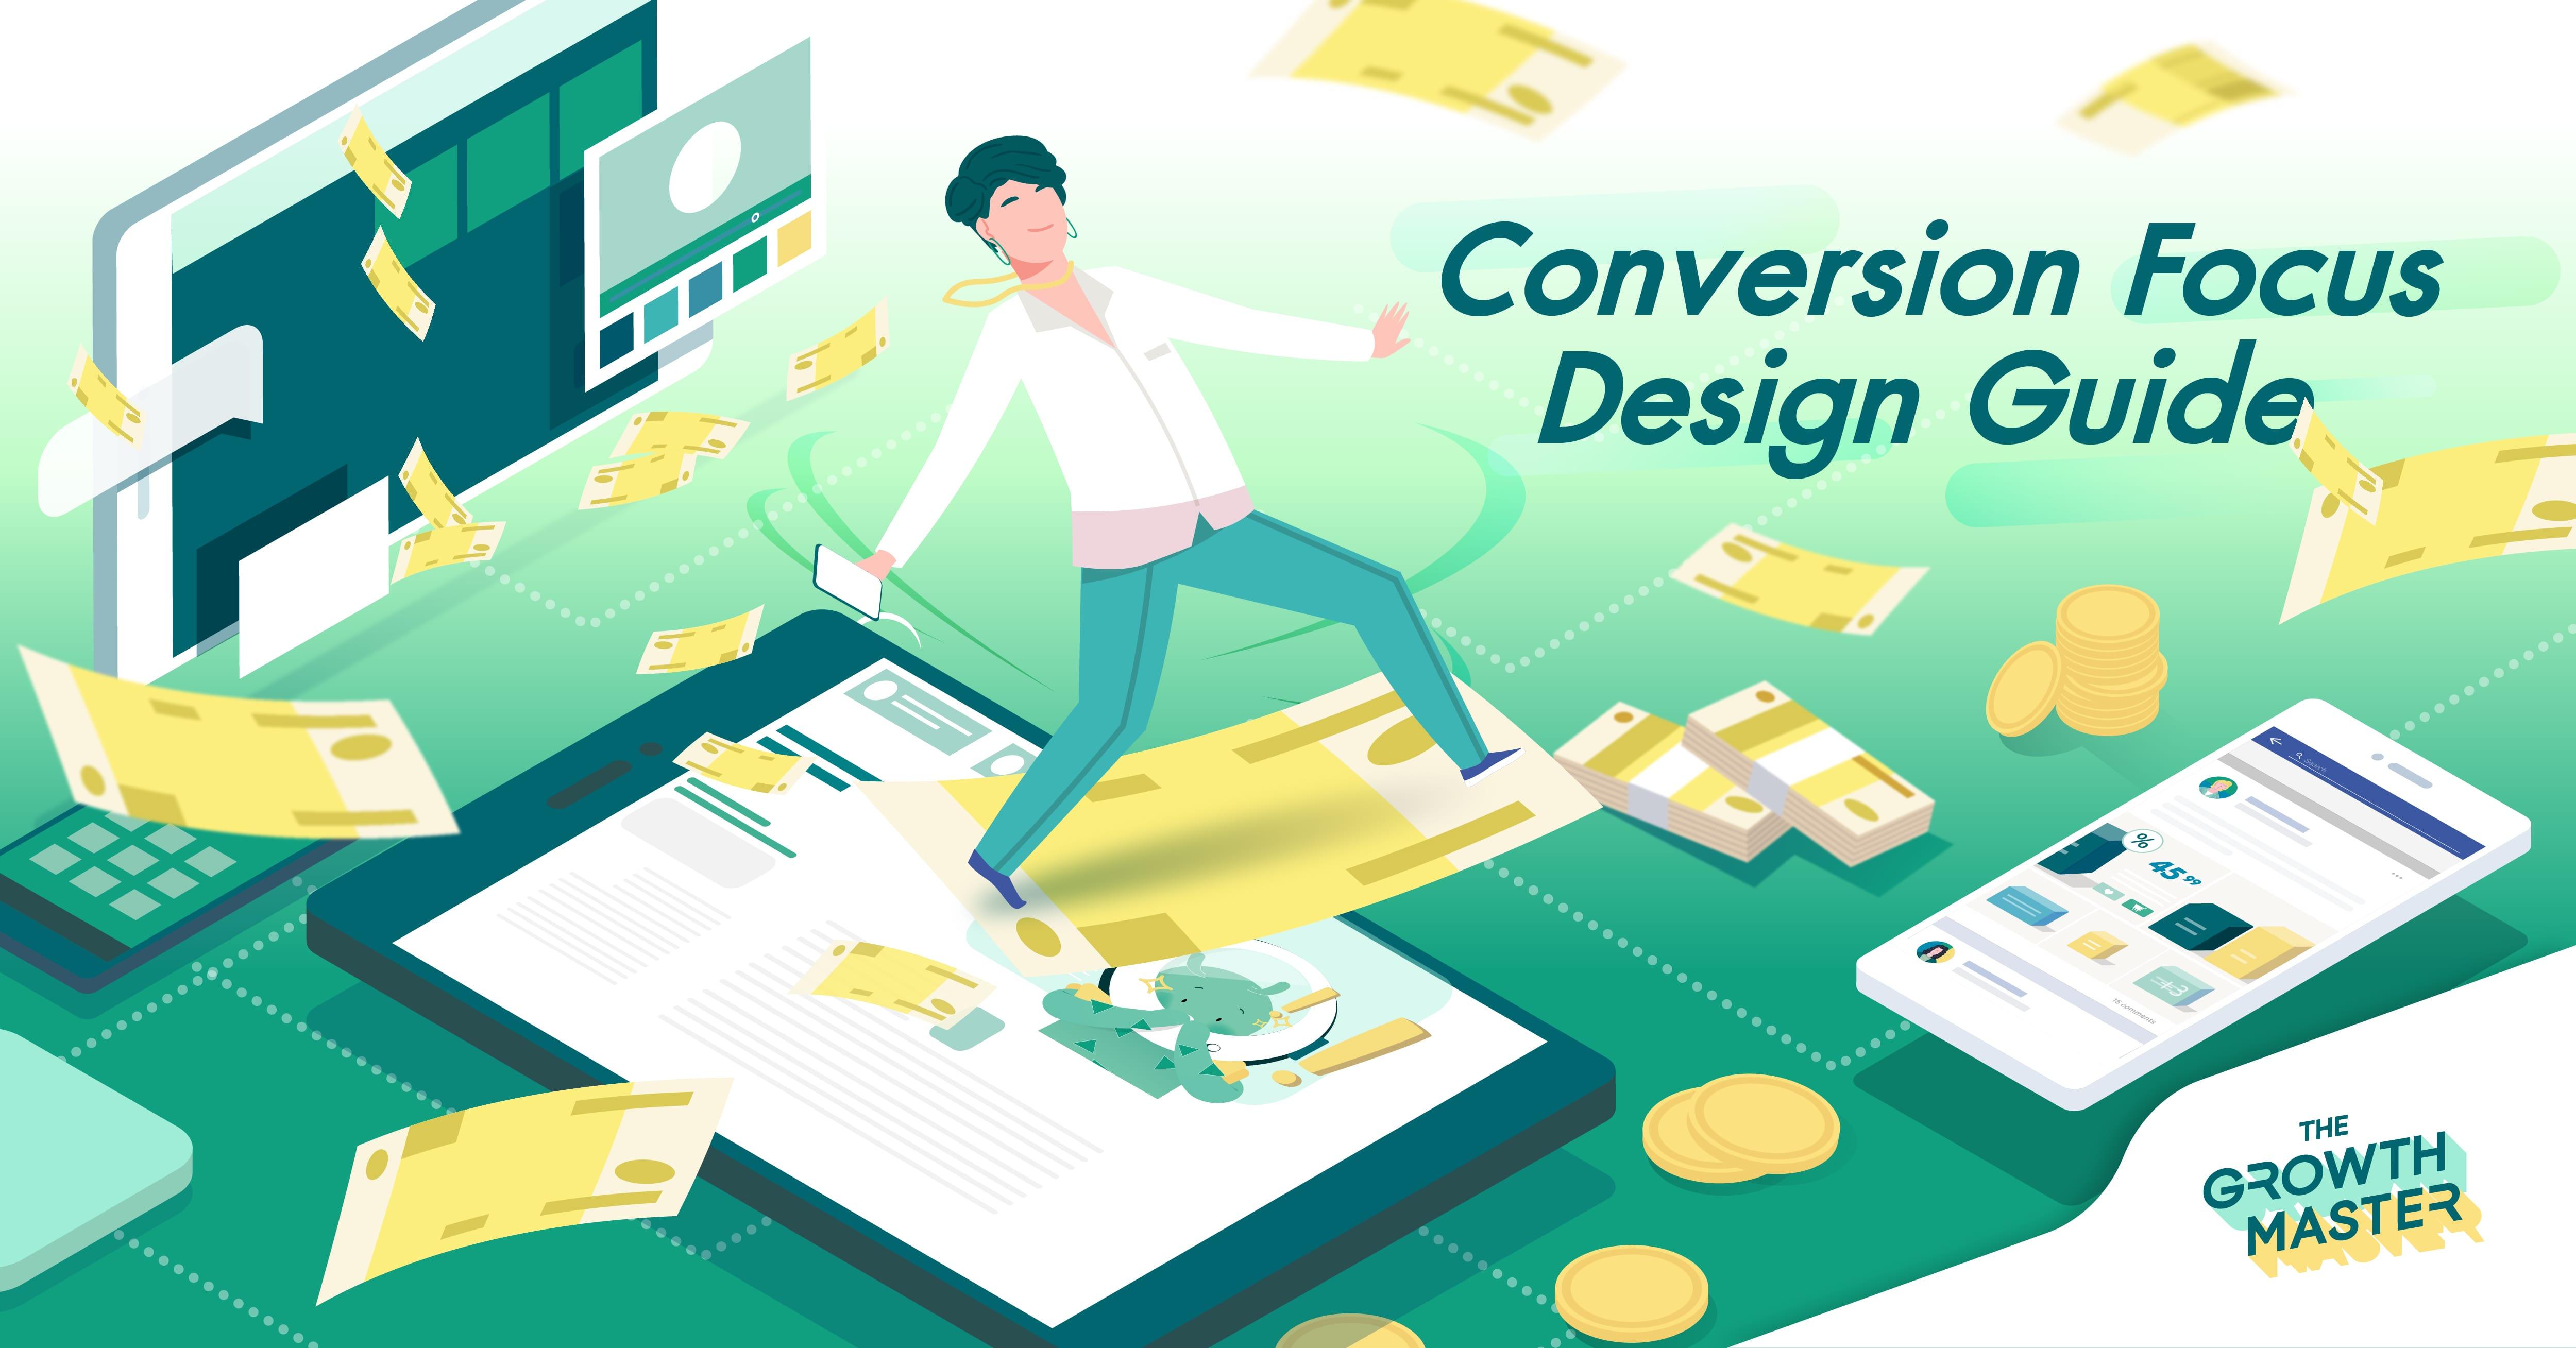 Conversion Focus Design Guide เทคนิคออกแบบเว็บไซต์ธุรกิจให้ได้ Conversion เพิ่มขึ้น